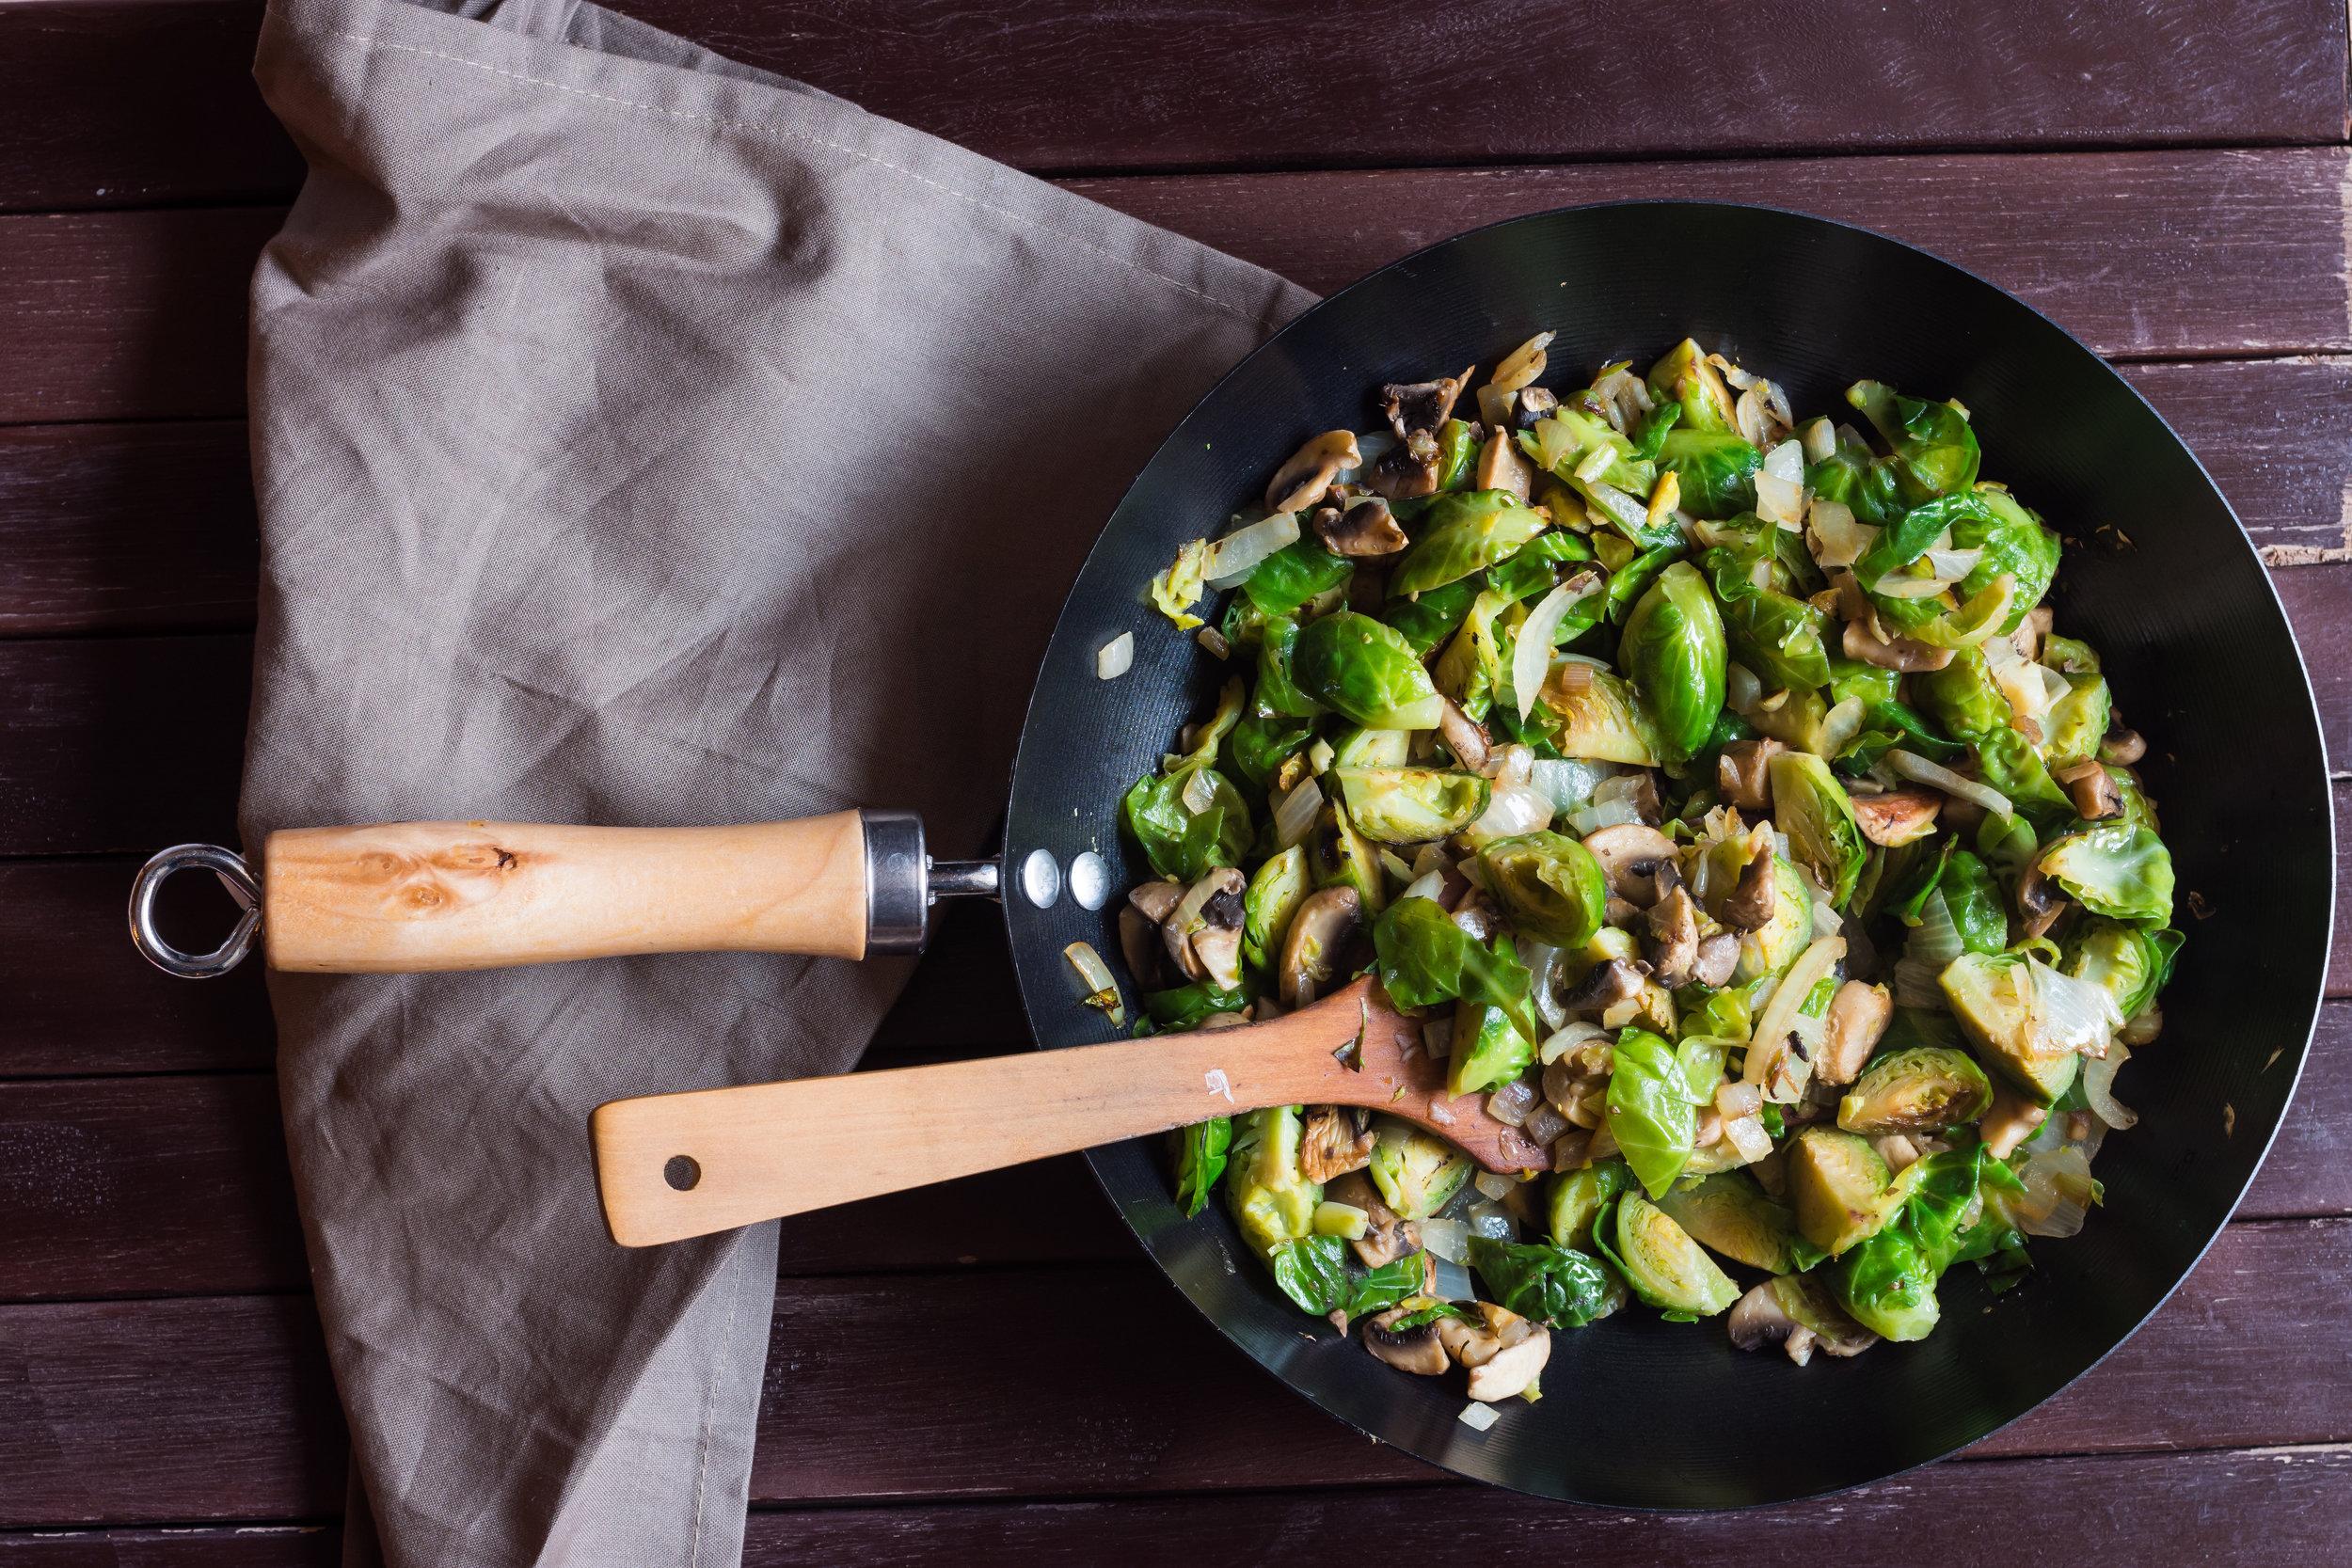 simple sautéed veggies easy cooking